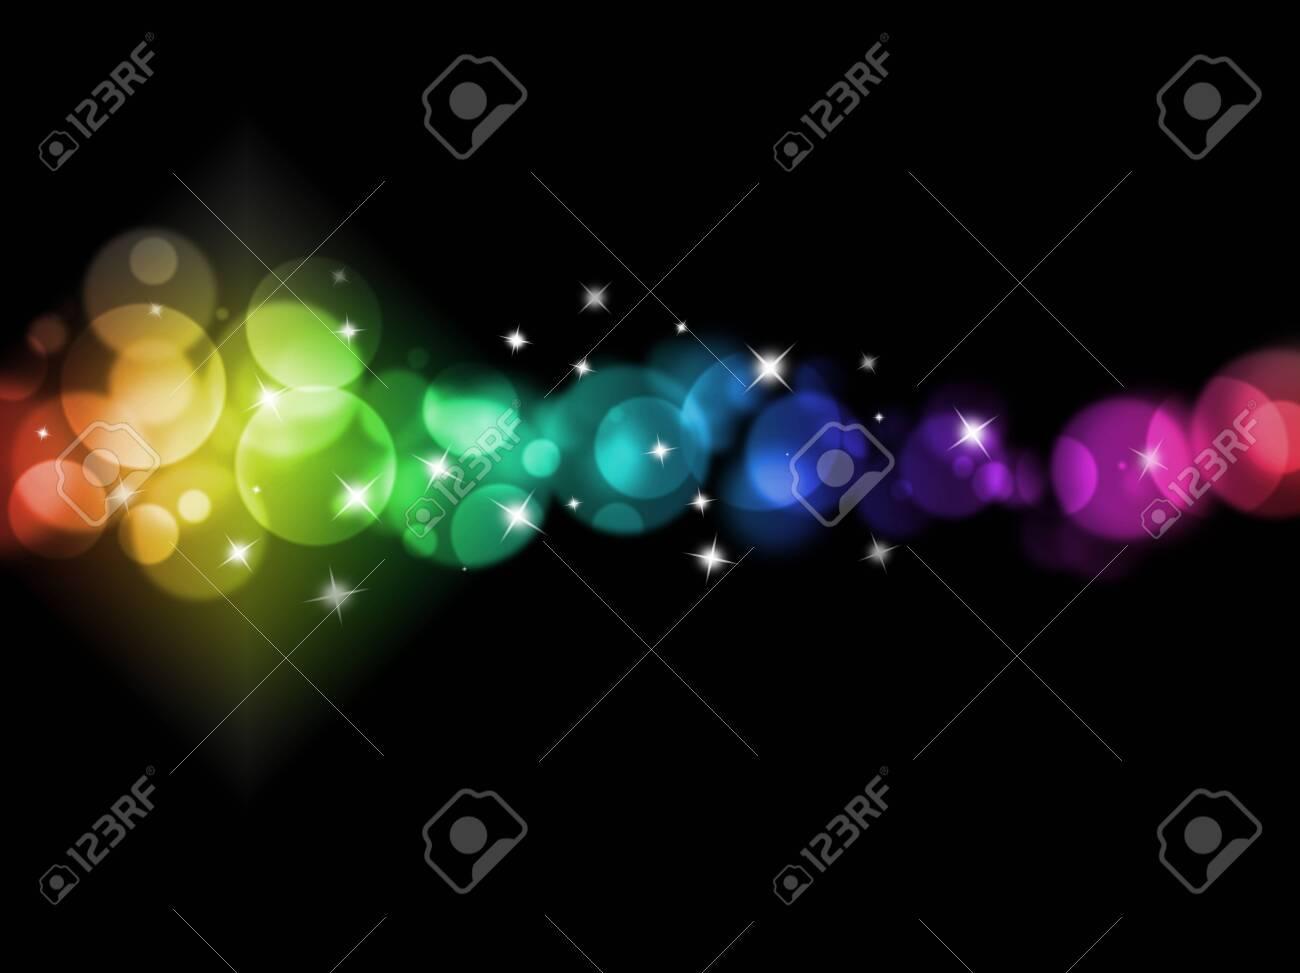 blurred colored lights holiday illumination background - 147303271